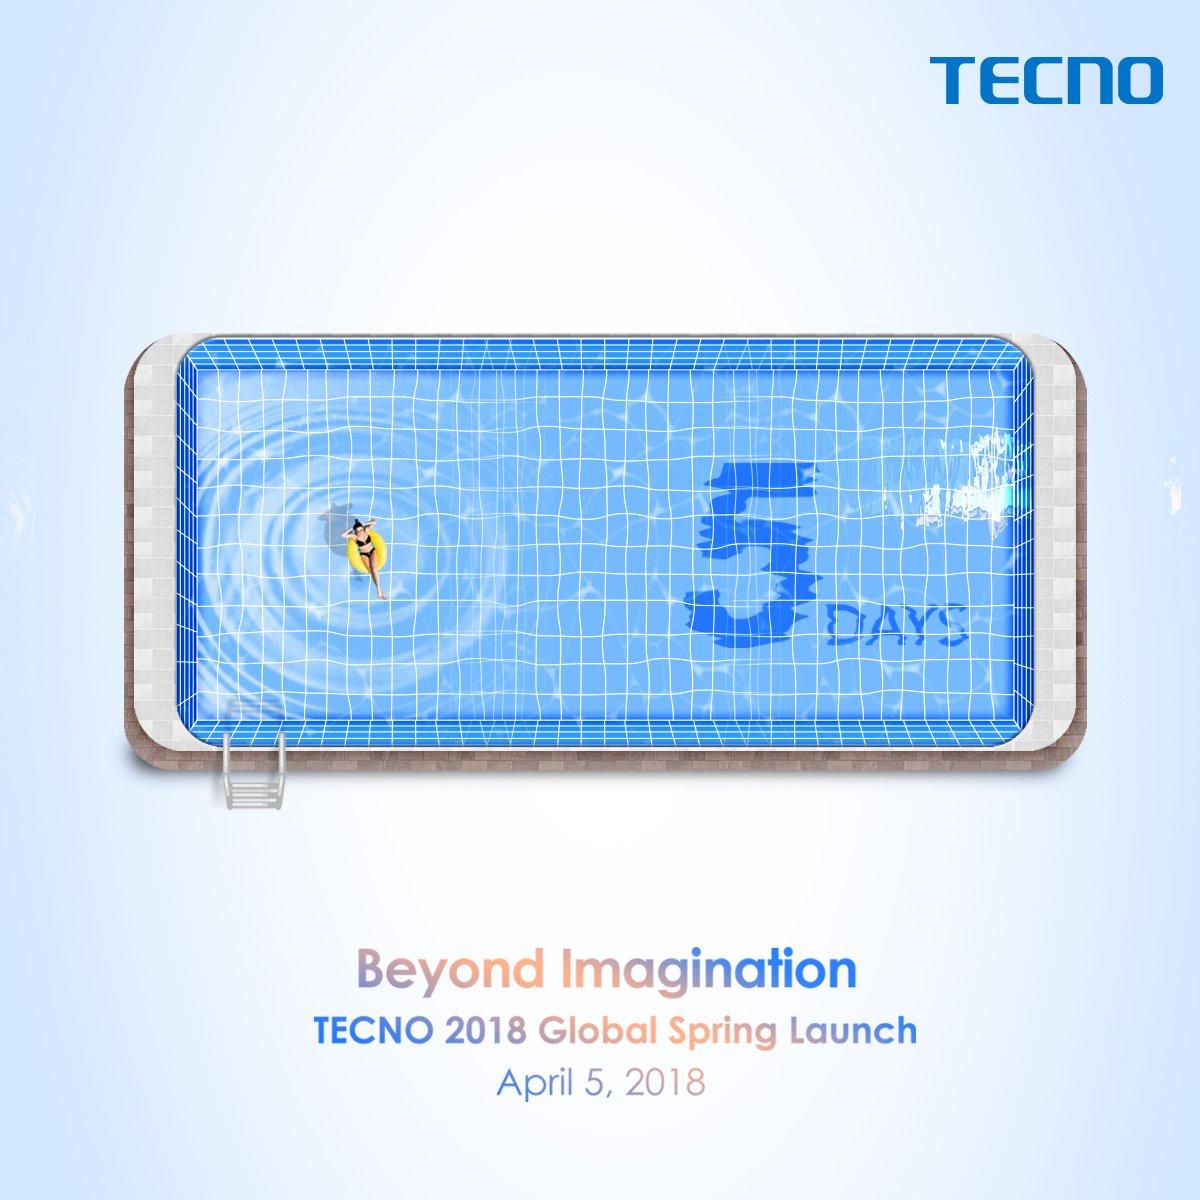 The New Tecno Camon X